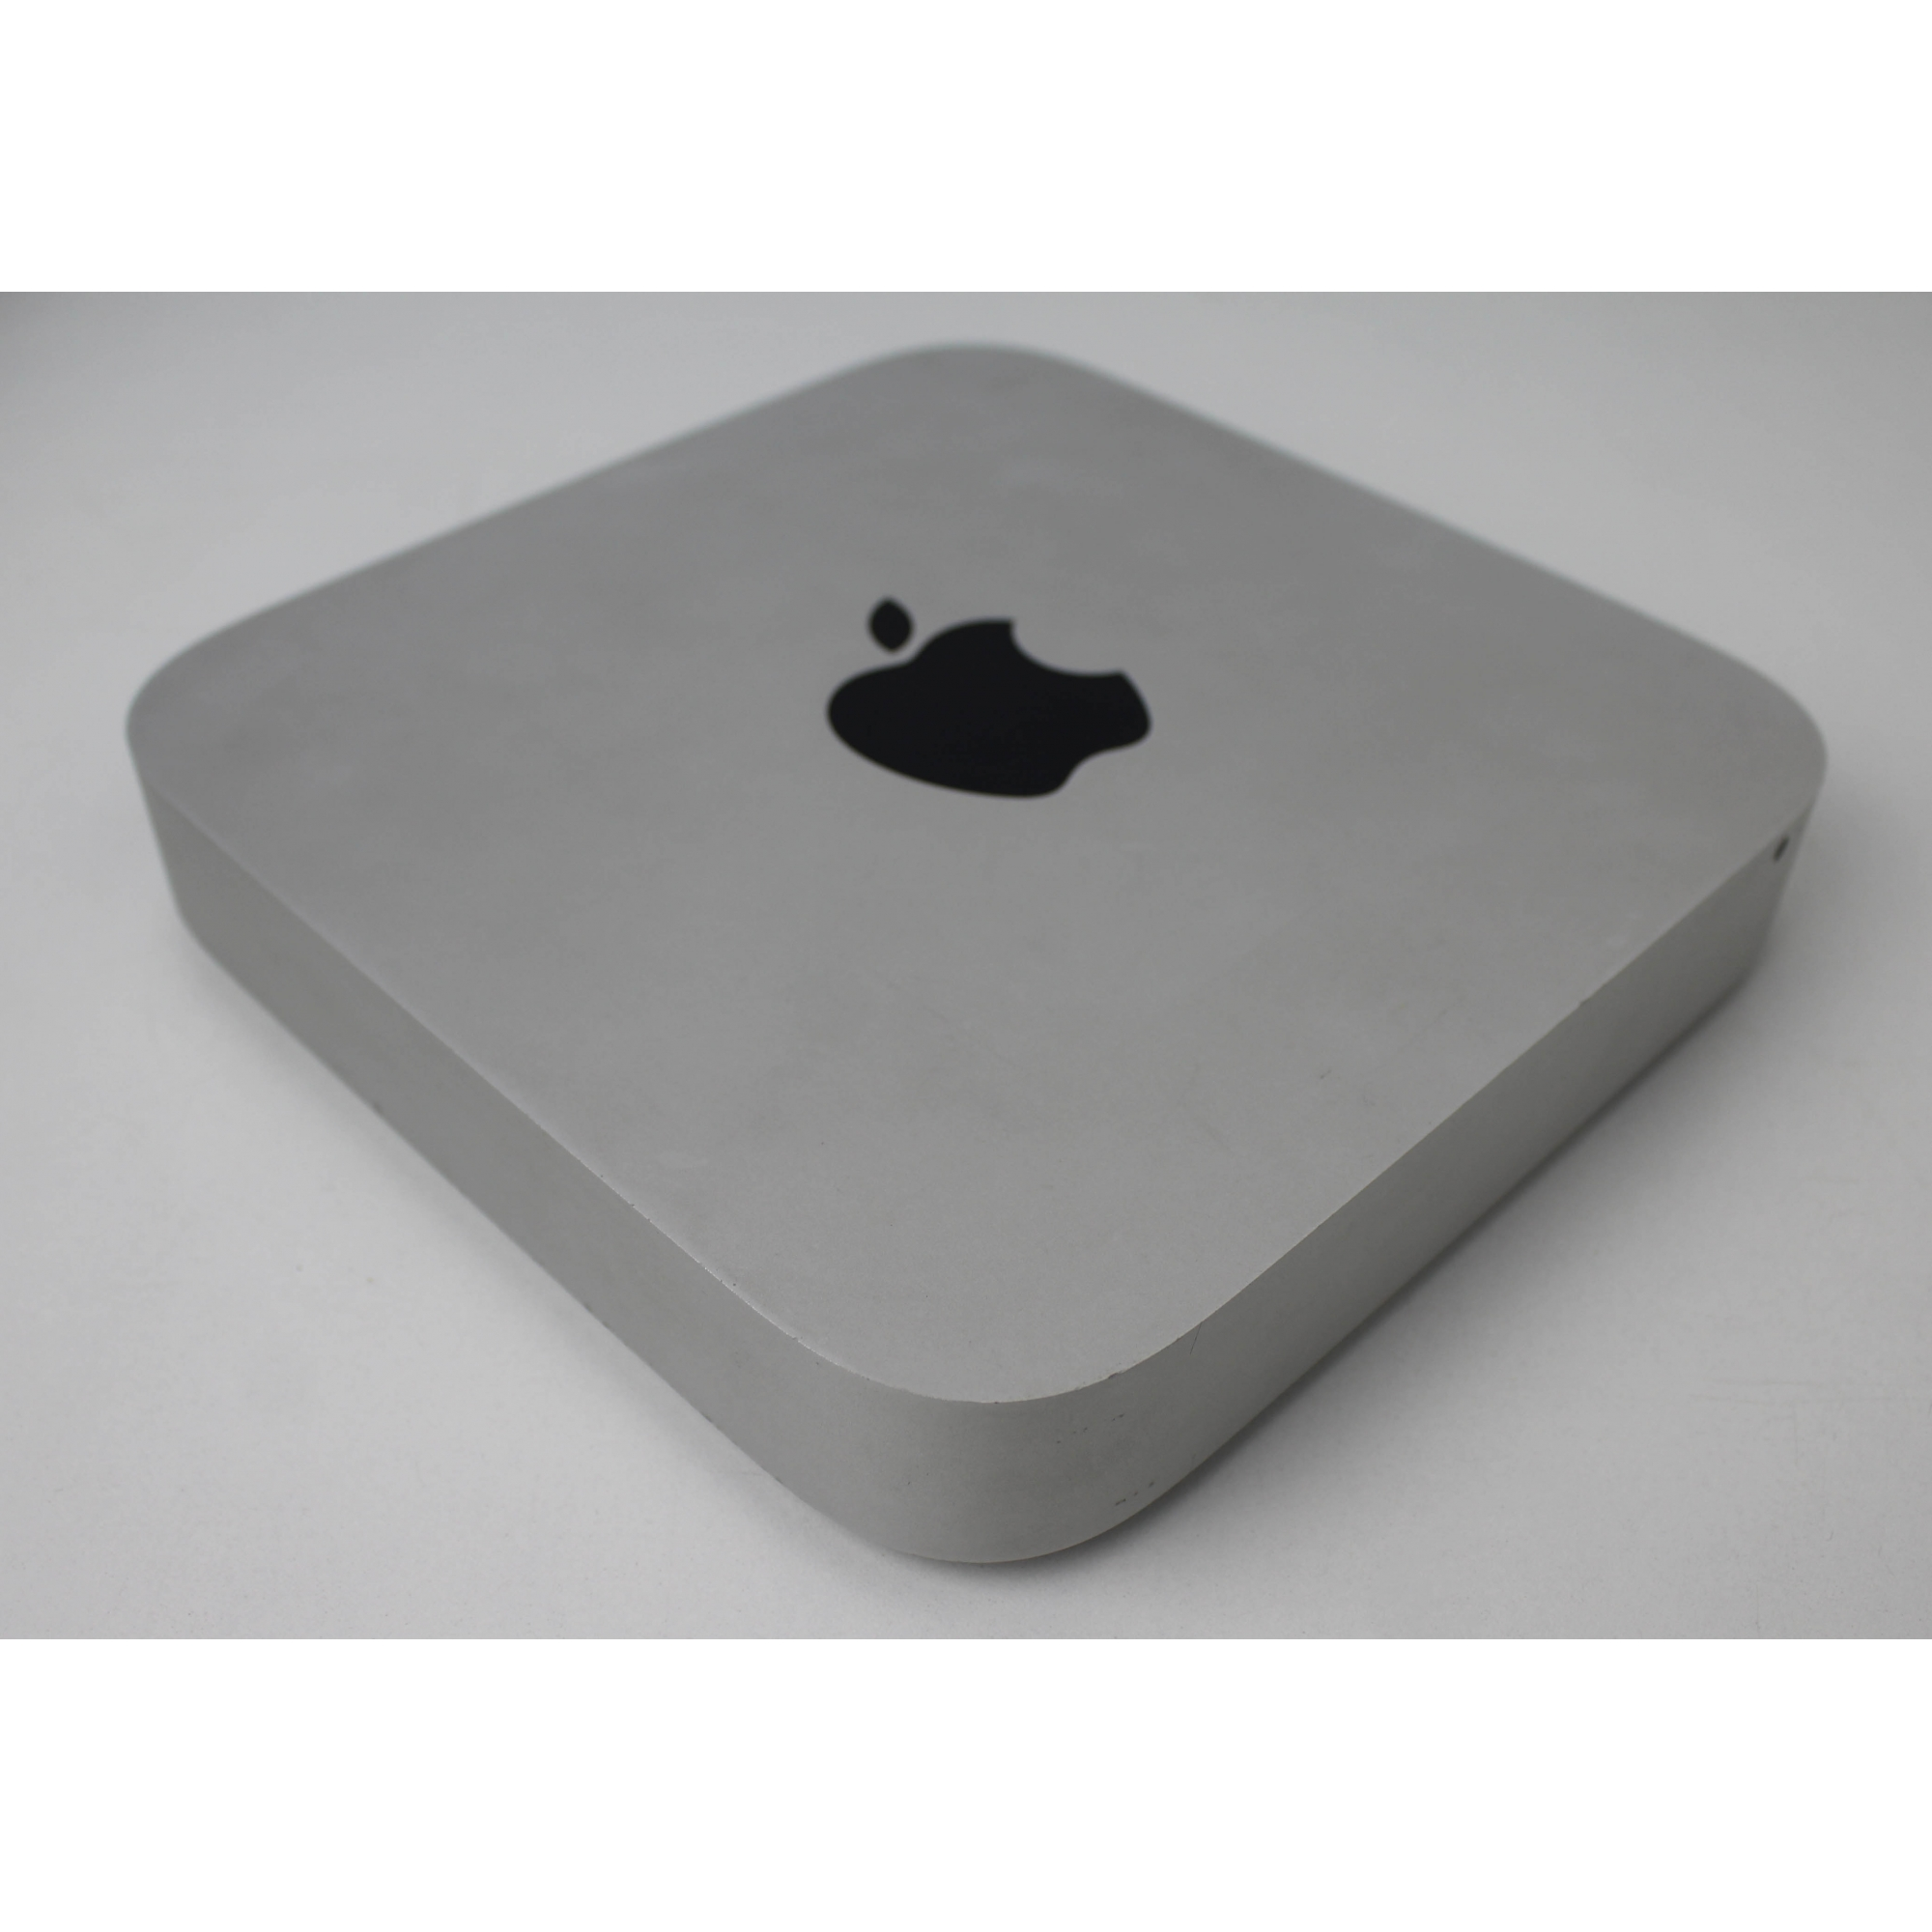 MAC MINI MD387LL/A INTEL CORE I5 2.5GHZ 8GB HD-500GB + SSD-120GB